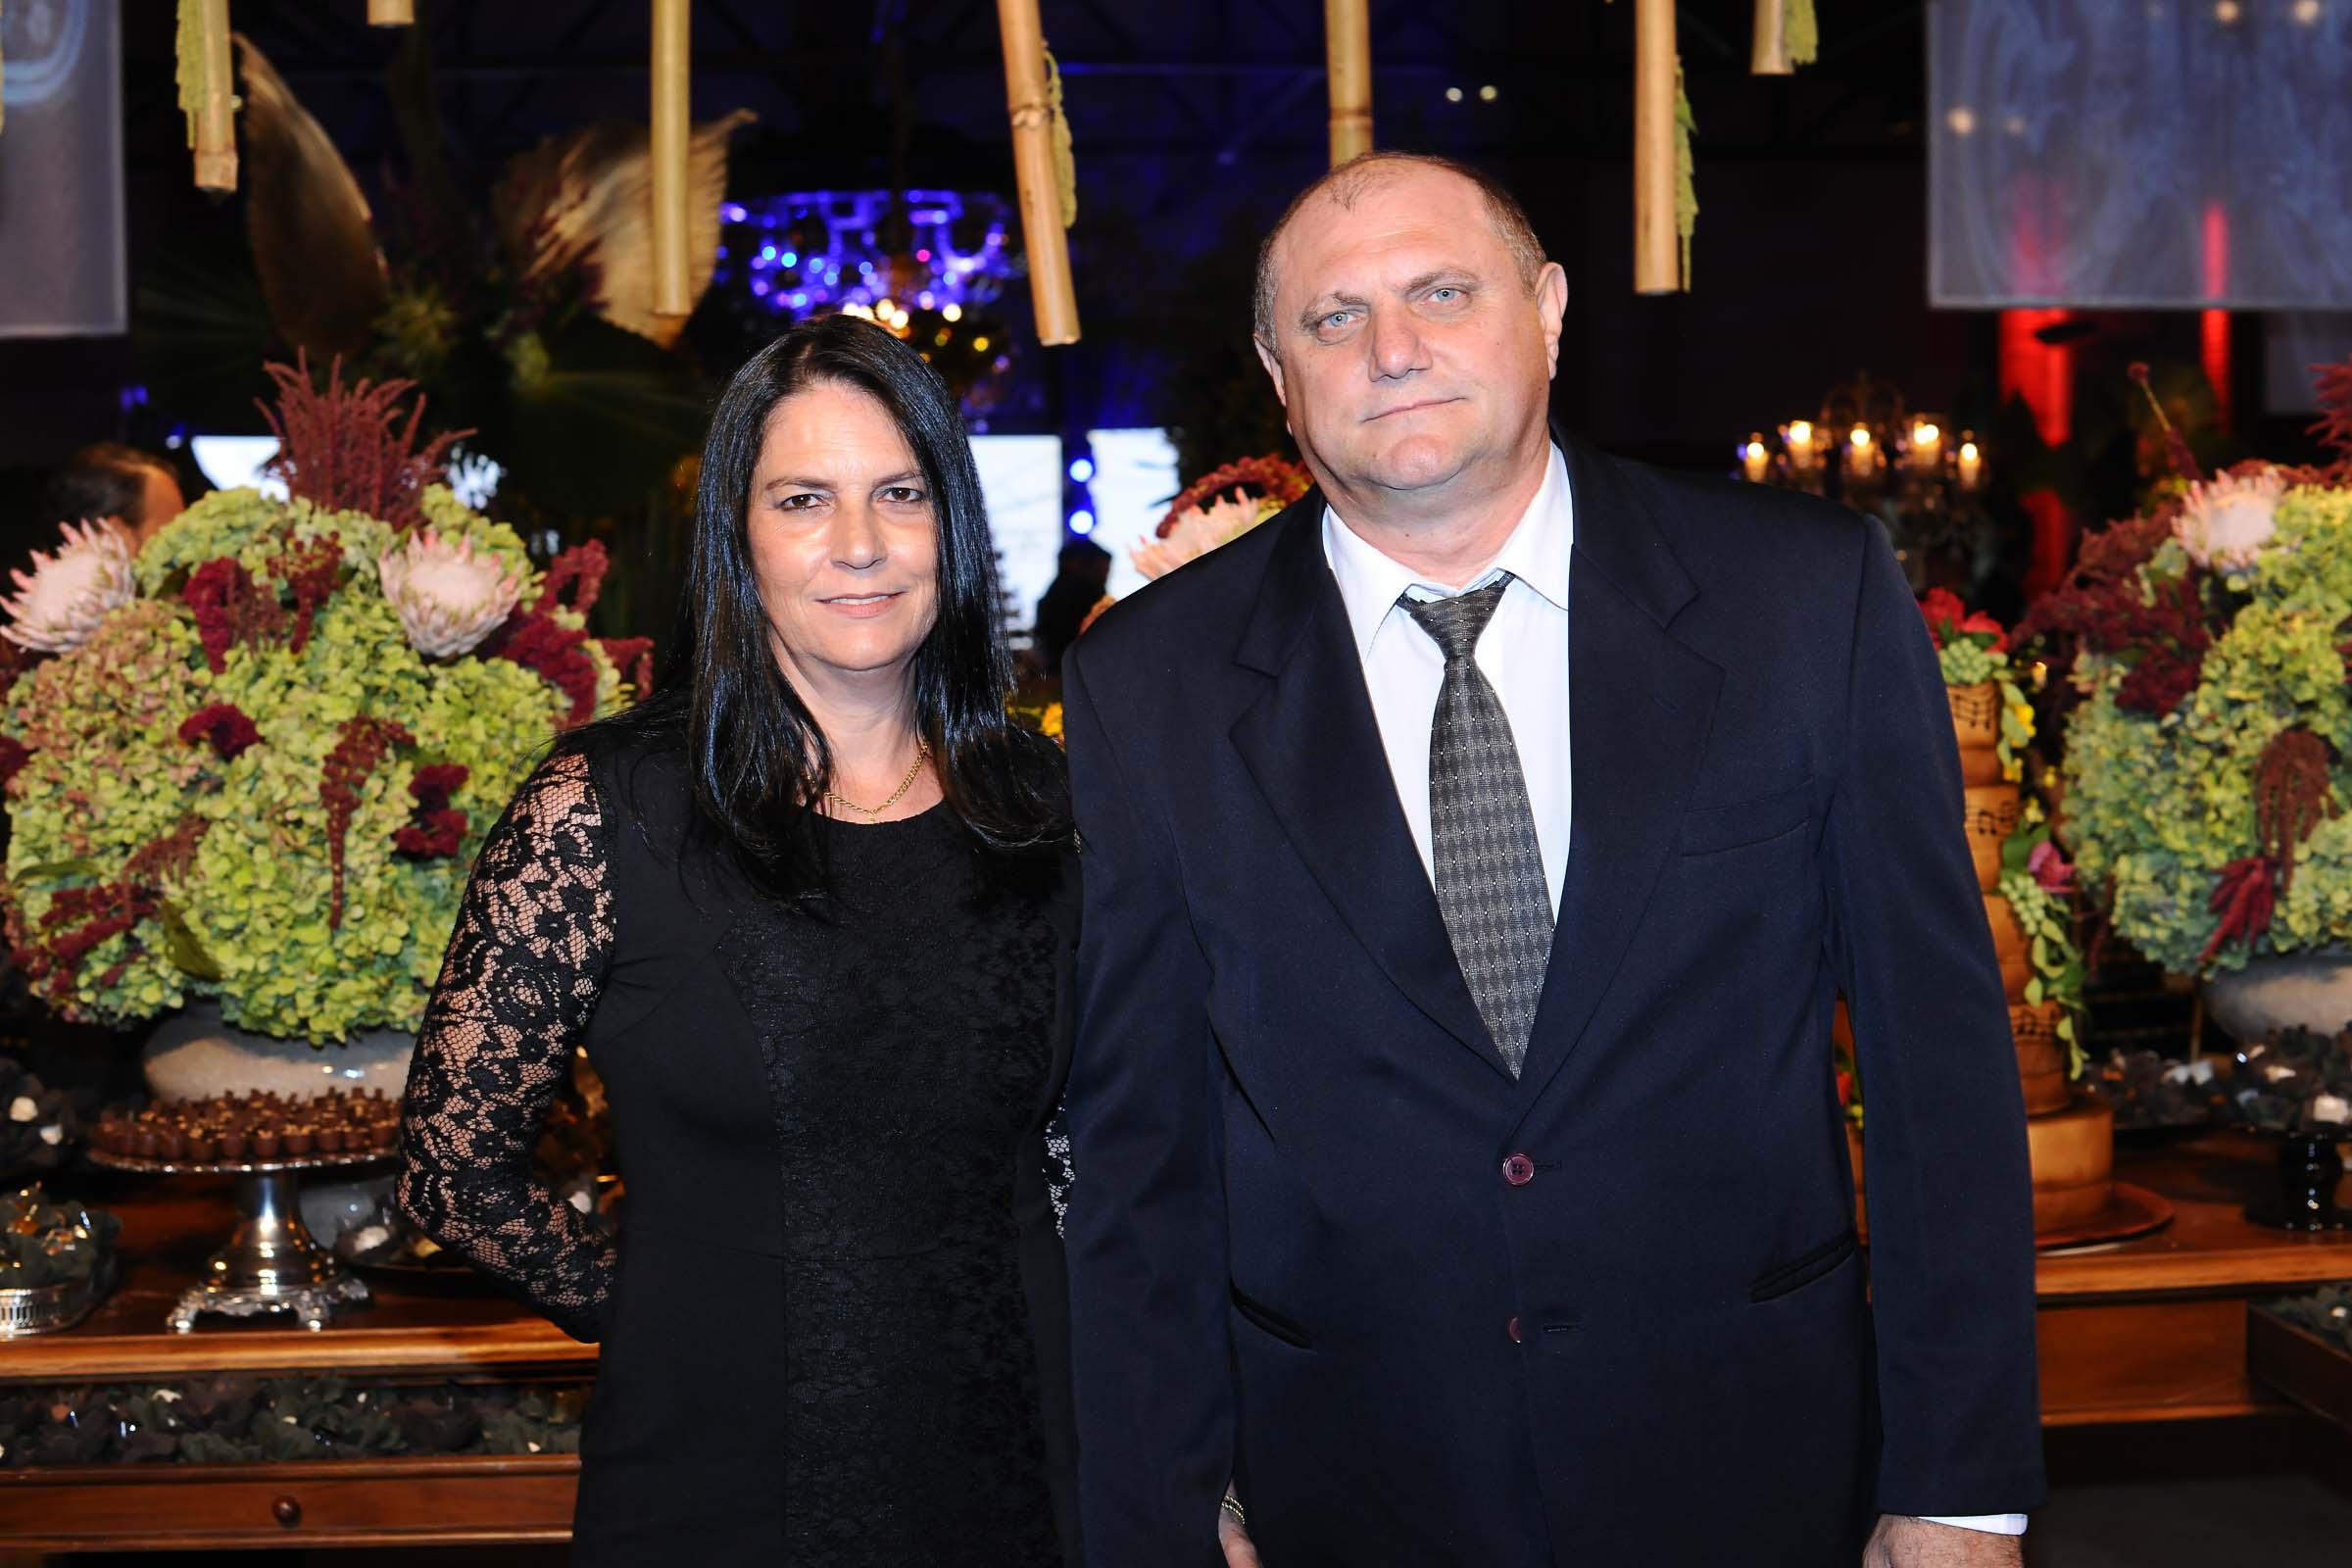 O casal Lourdes Poli e Claudio Roberto Martelli